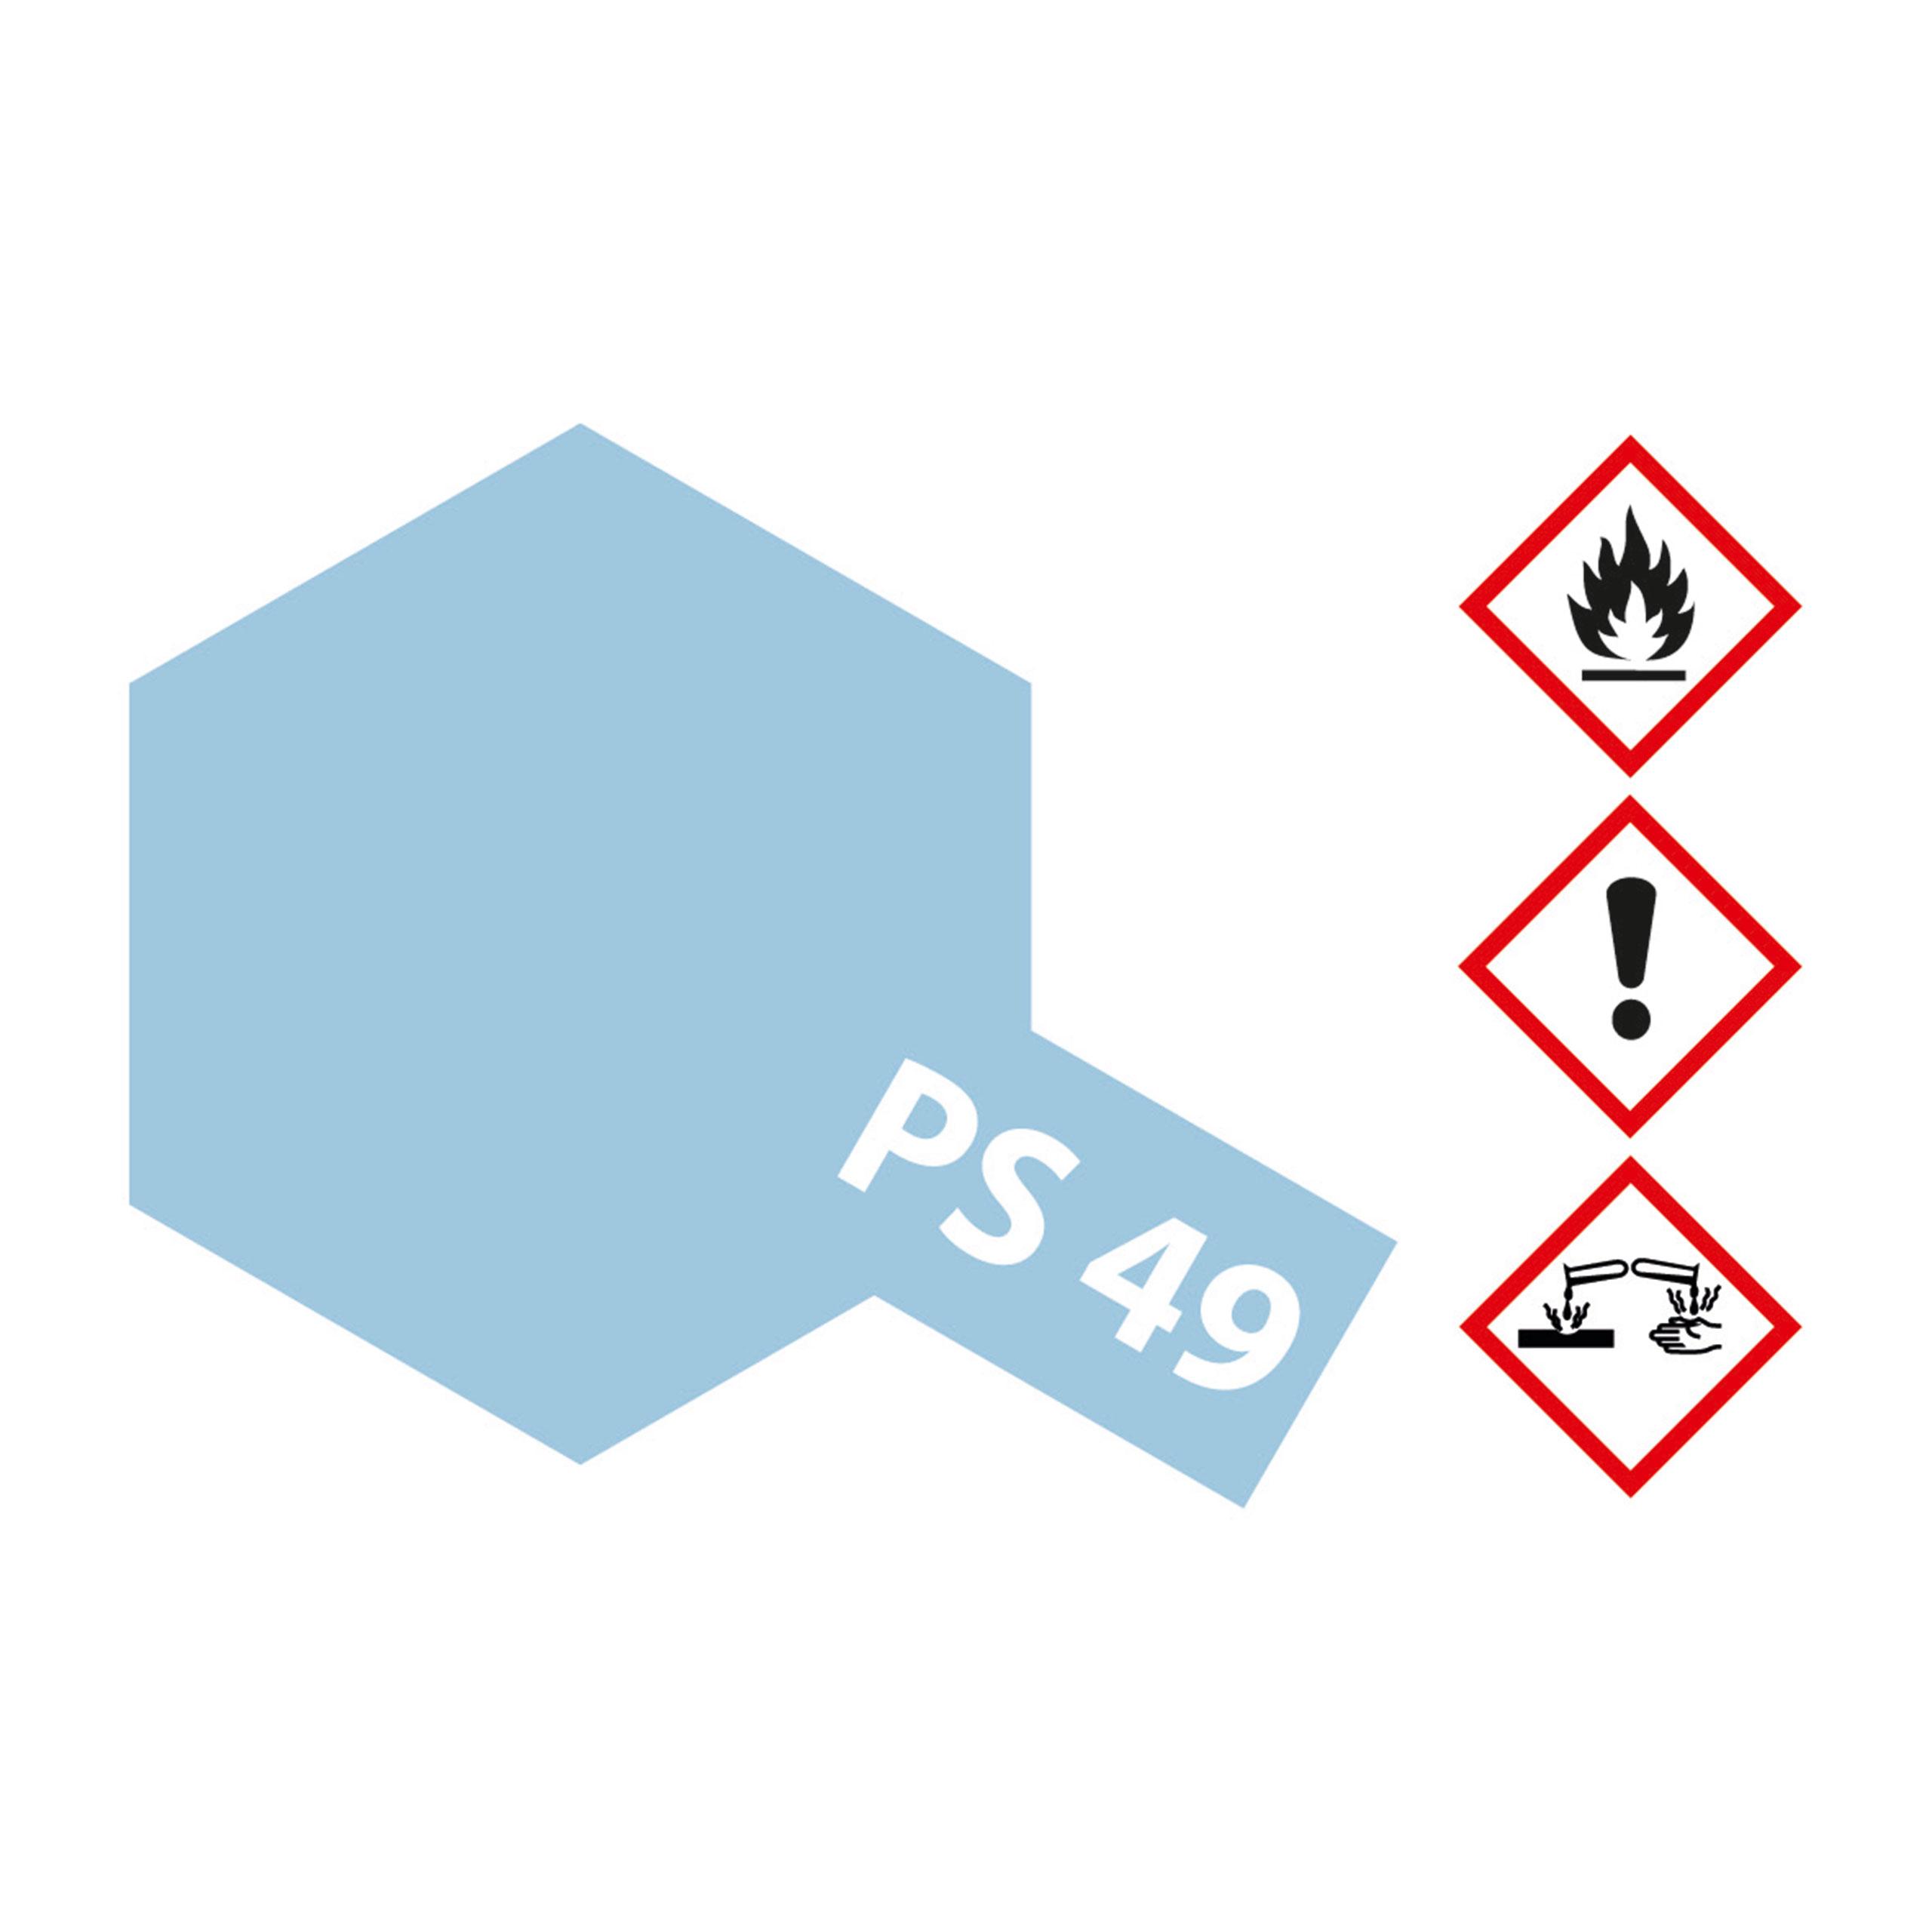 PS-49 Alu-Effektblau Polyc. - 100ml Sprayfarbe Lexan - Tamiya 300086049